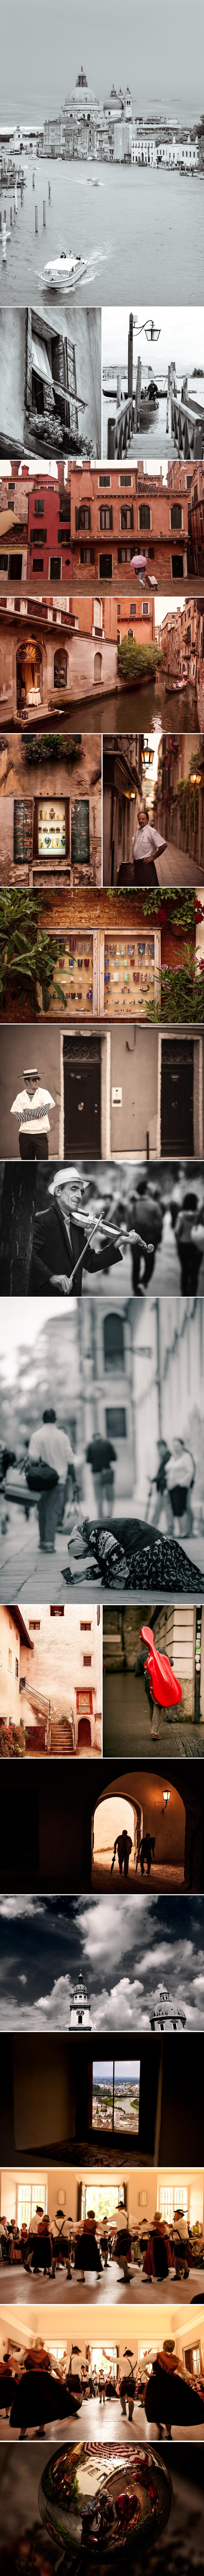 Venice Salzburg Images 2.jpg